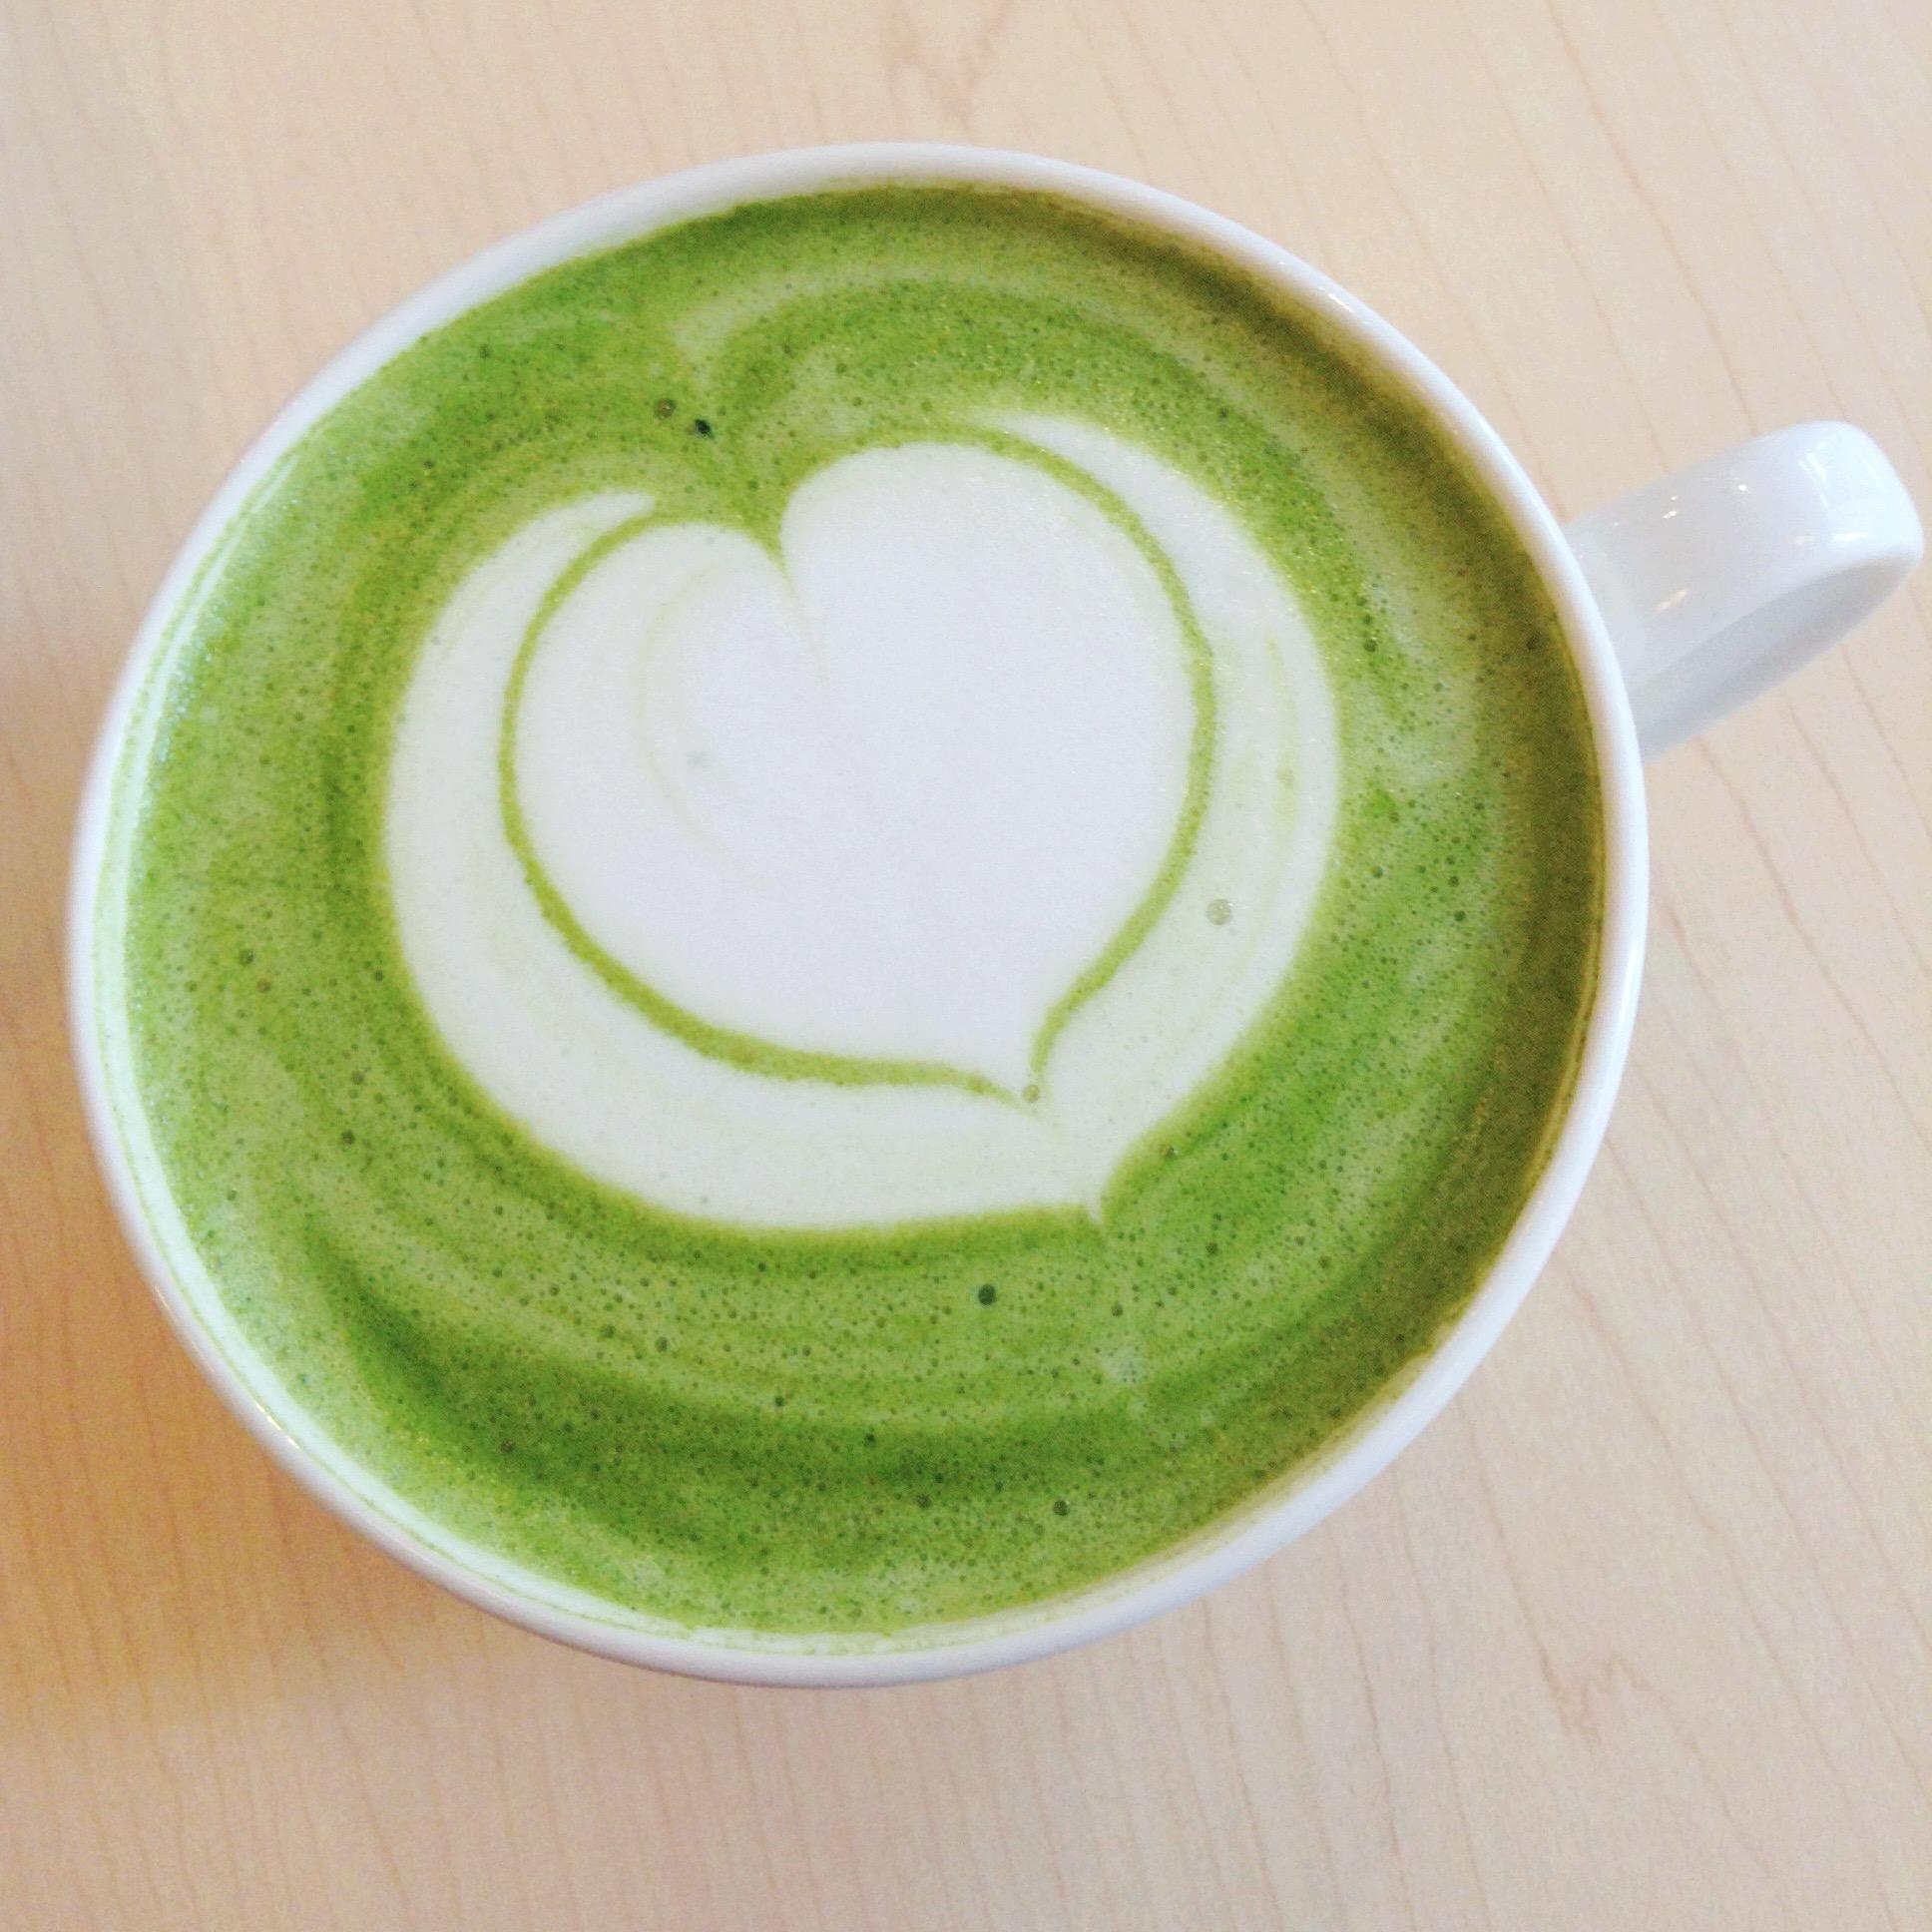 Pastel Creperie & Dessert House - Green Tea Latte - HELLOTERI